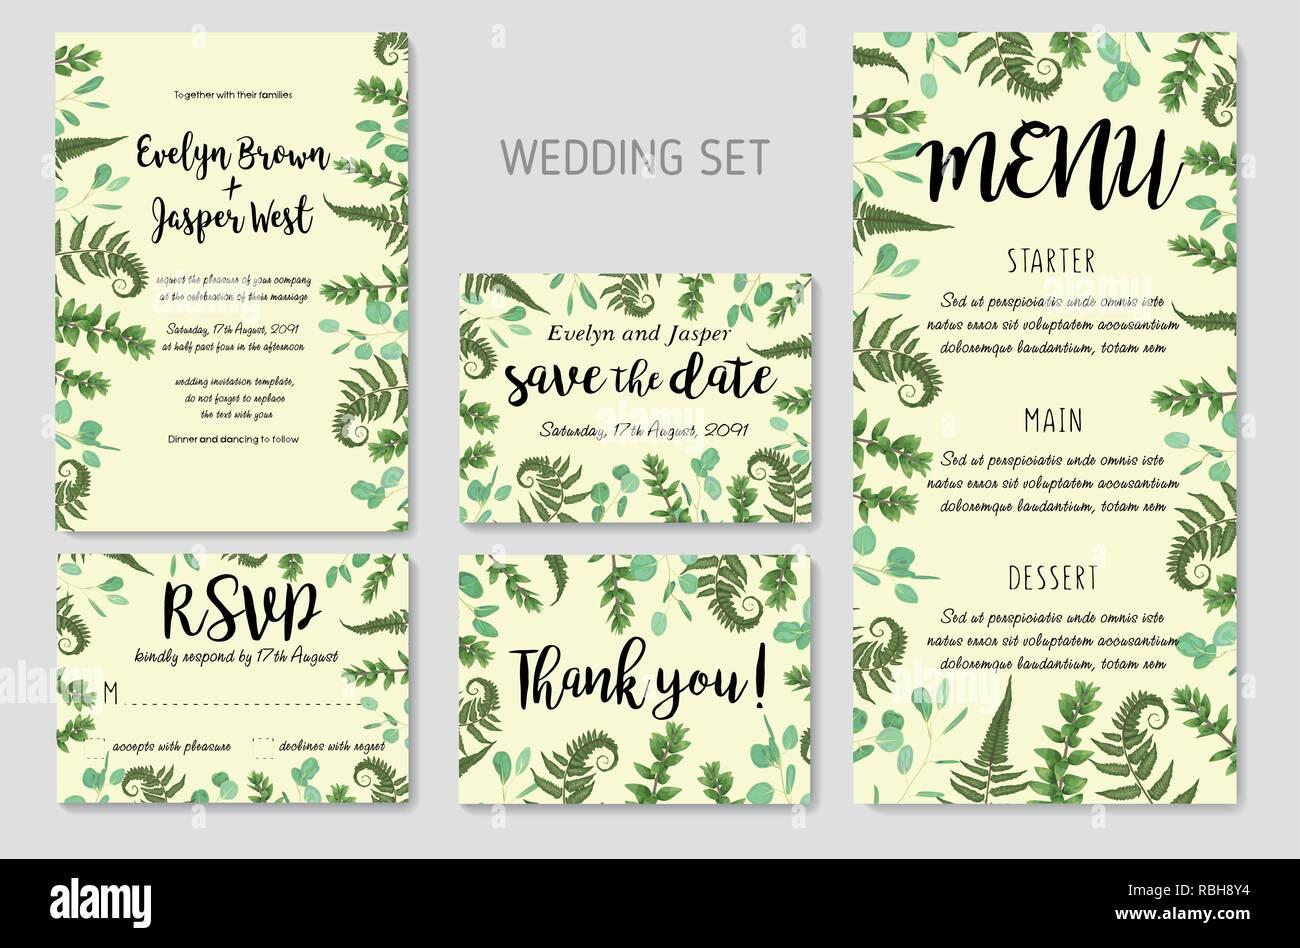 Wedding Invitation Floral Invite Thank You Rsvp Card Design